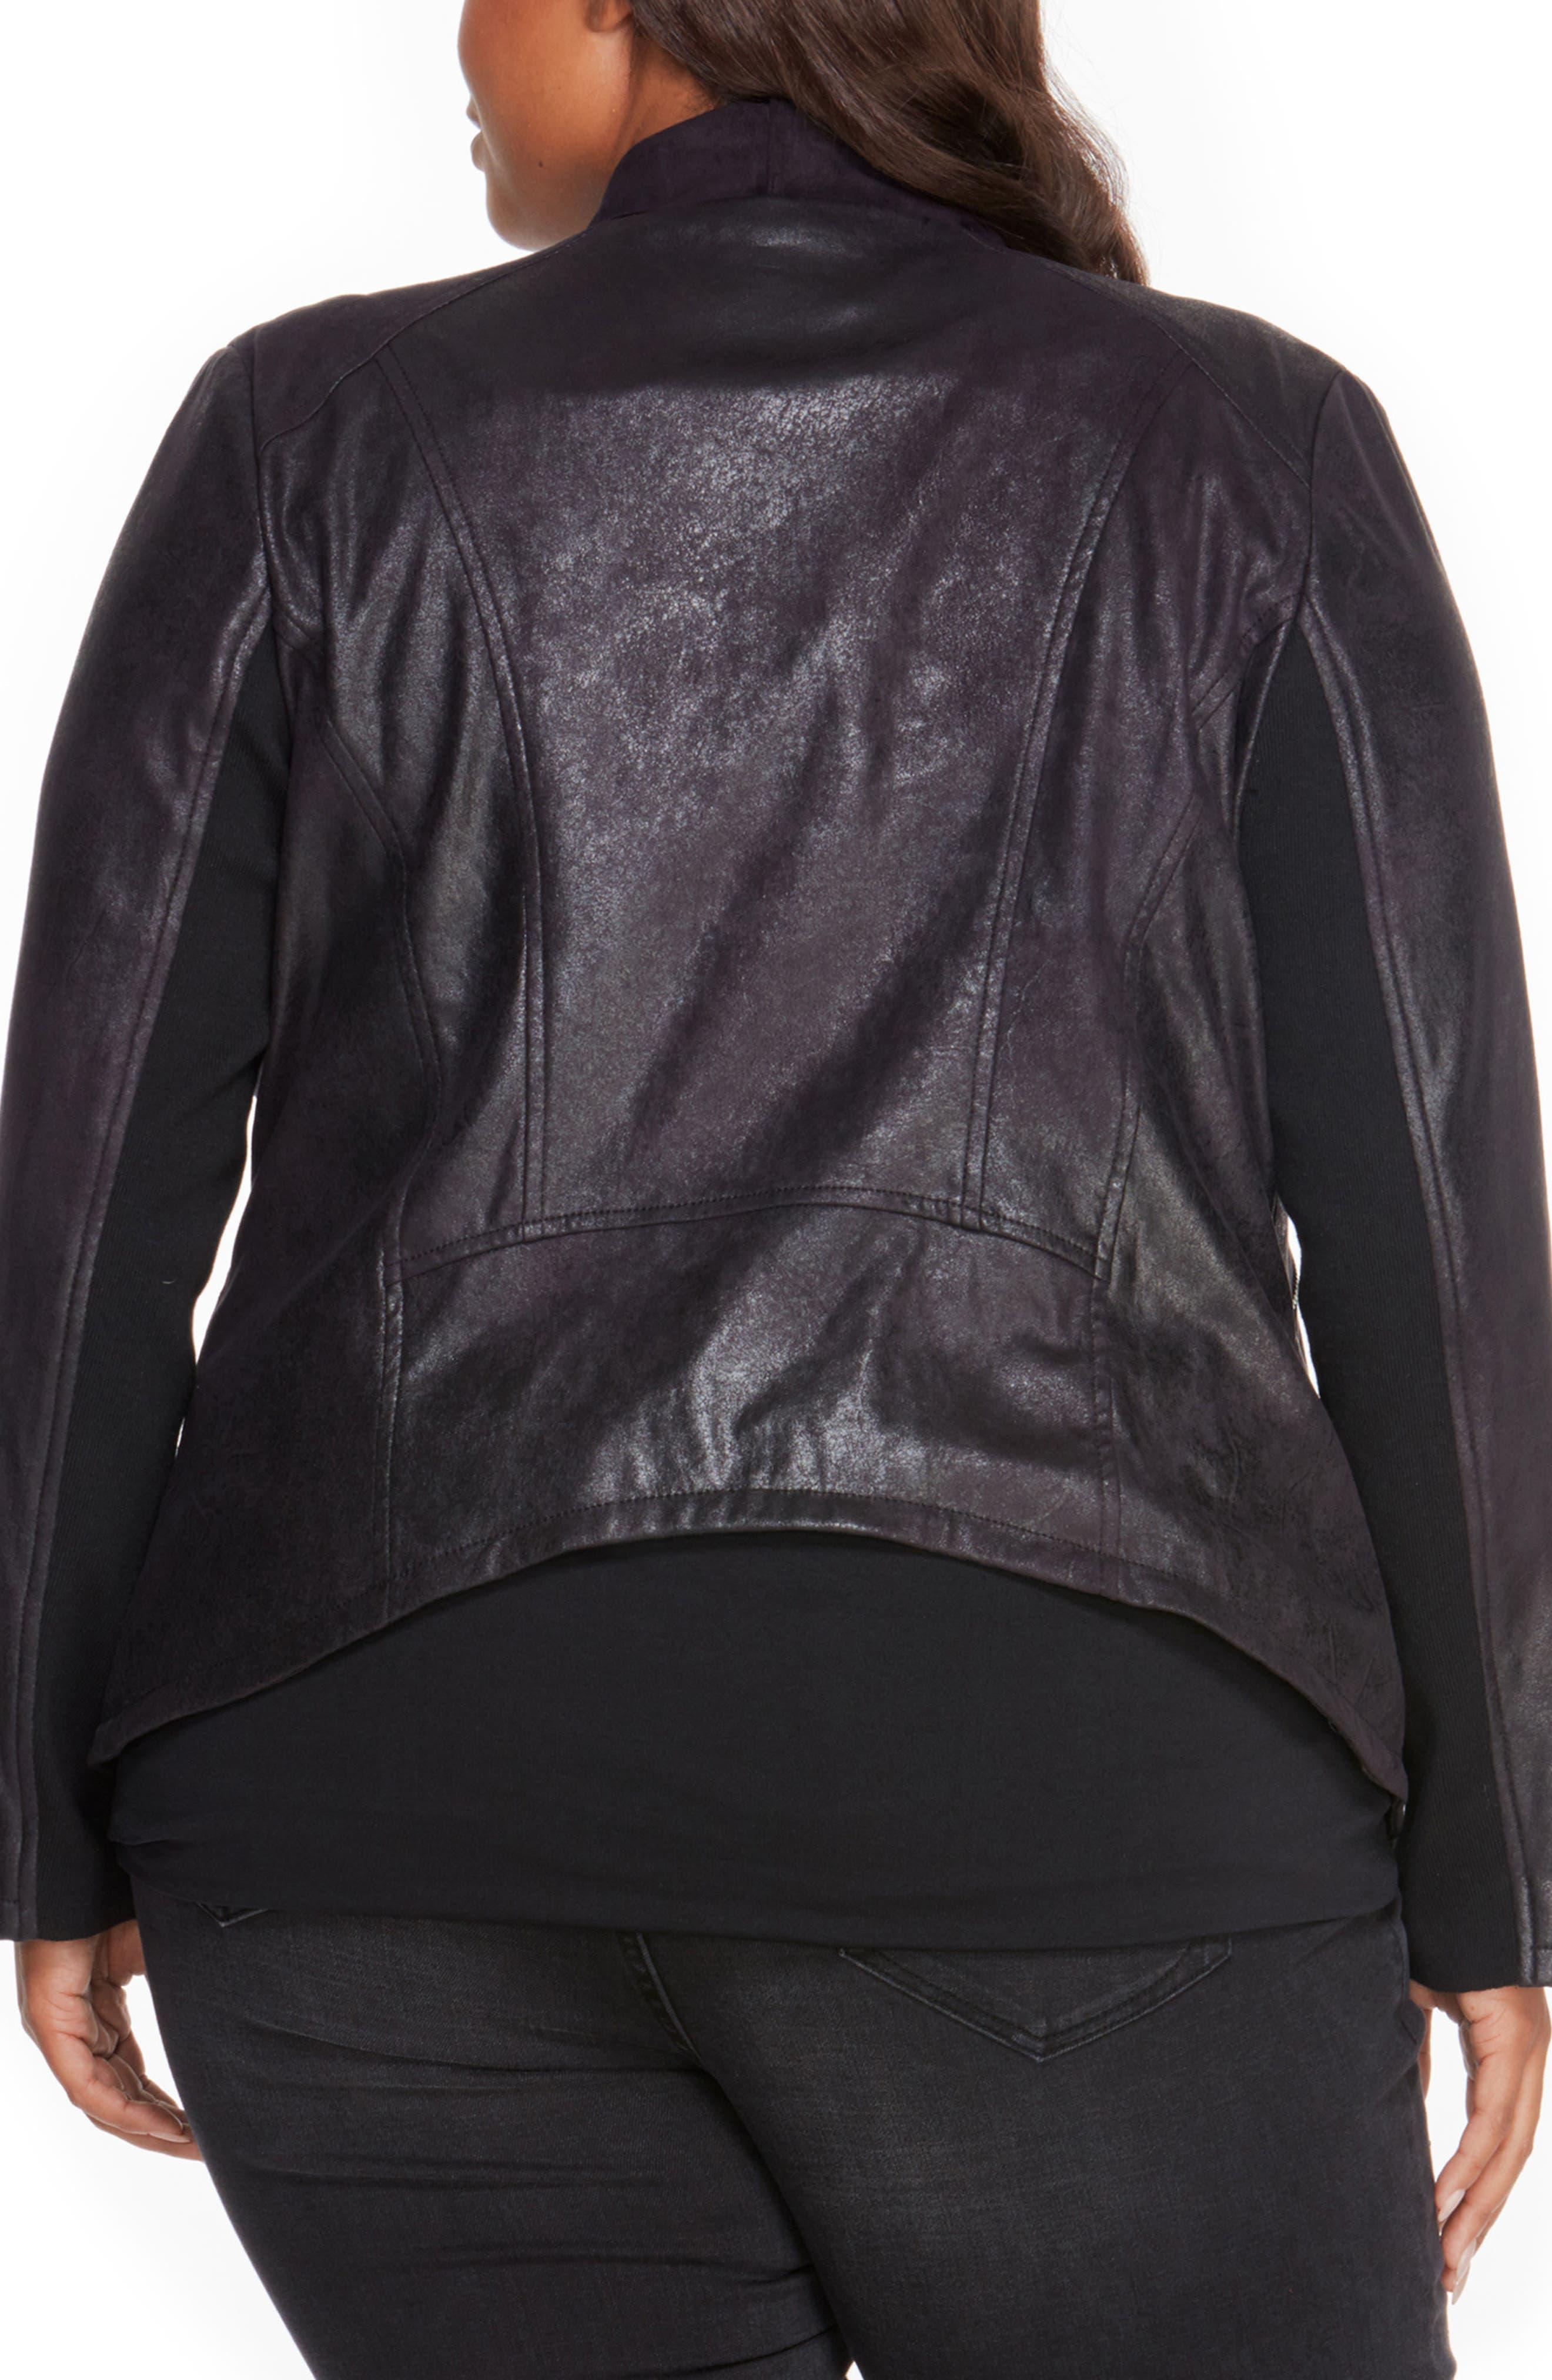 Alternate Image 2  - REBEL WILSON X ANGELS Asymmetrical Faux Leather Jacket (Plus Size)